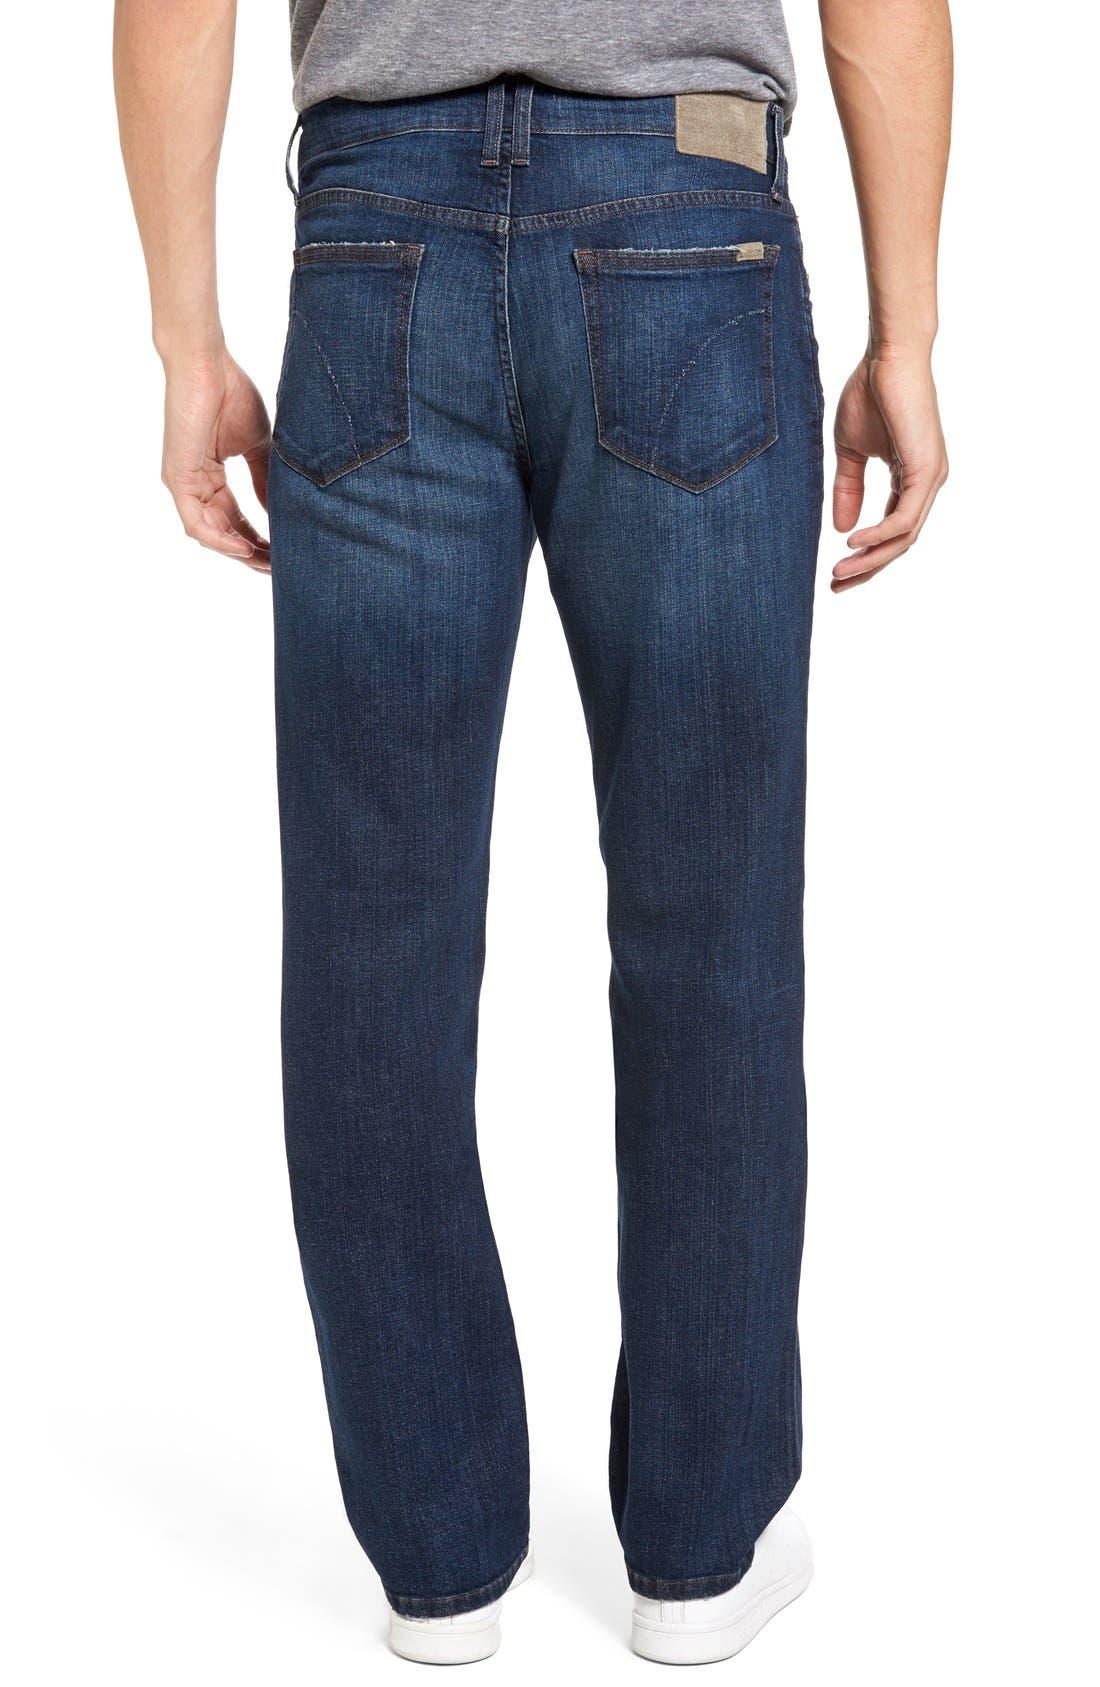 Alternate Image 2  - Joe's Rebel Relaxed Fit Jeans (Kane)